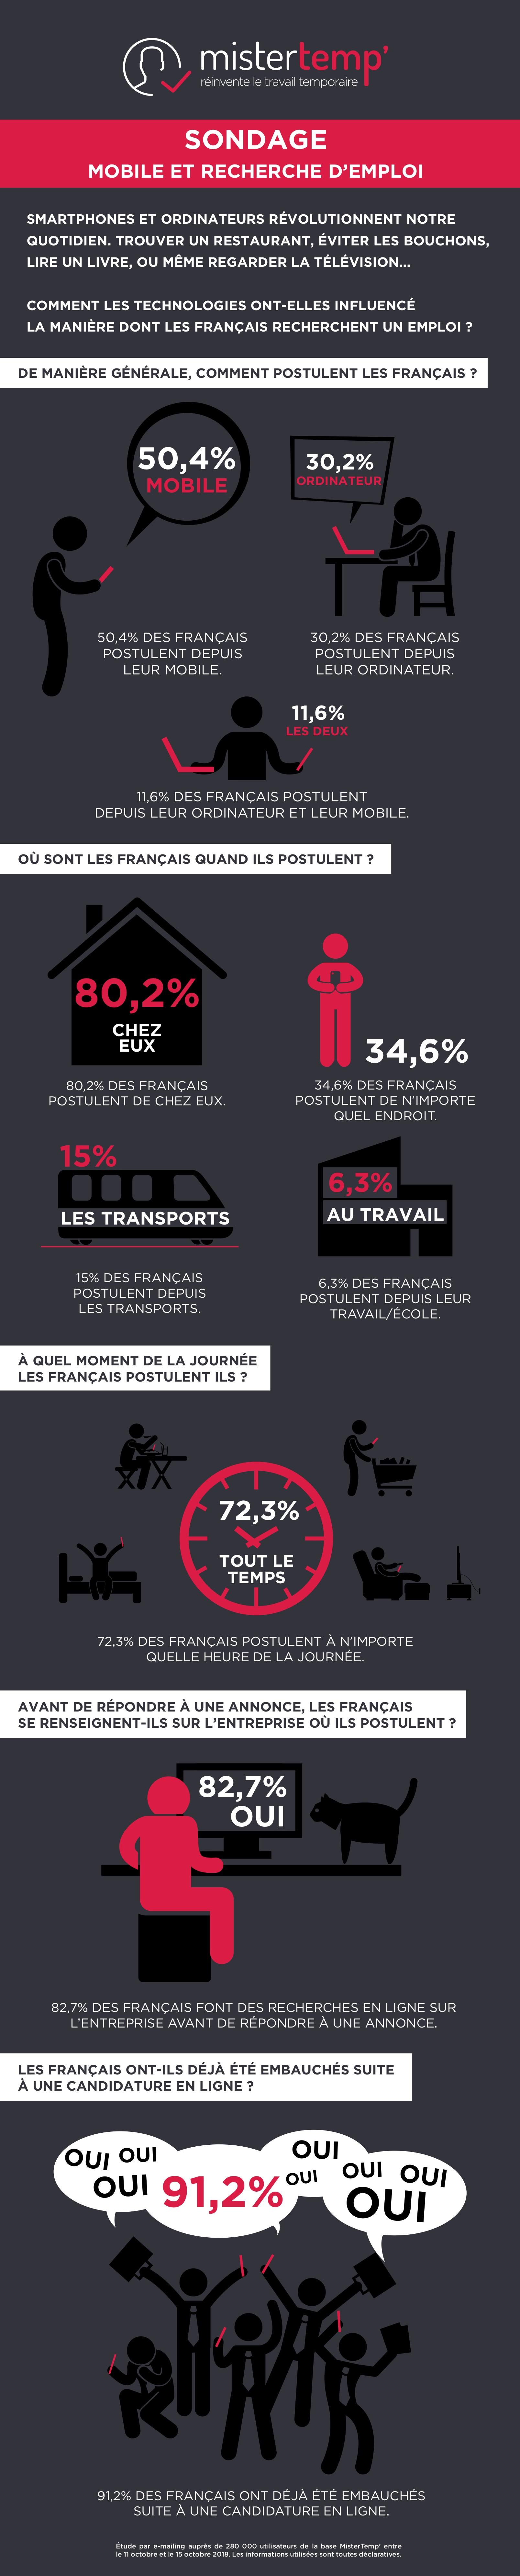 infographie-sondage-m-emploi